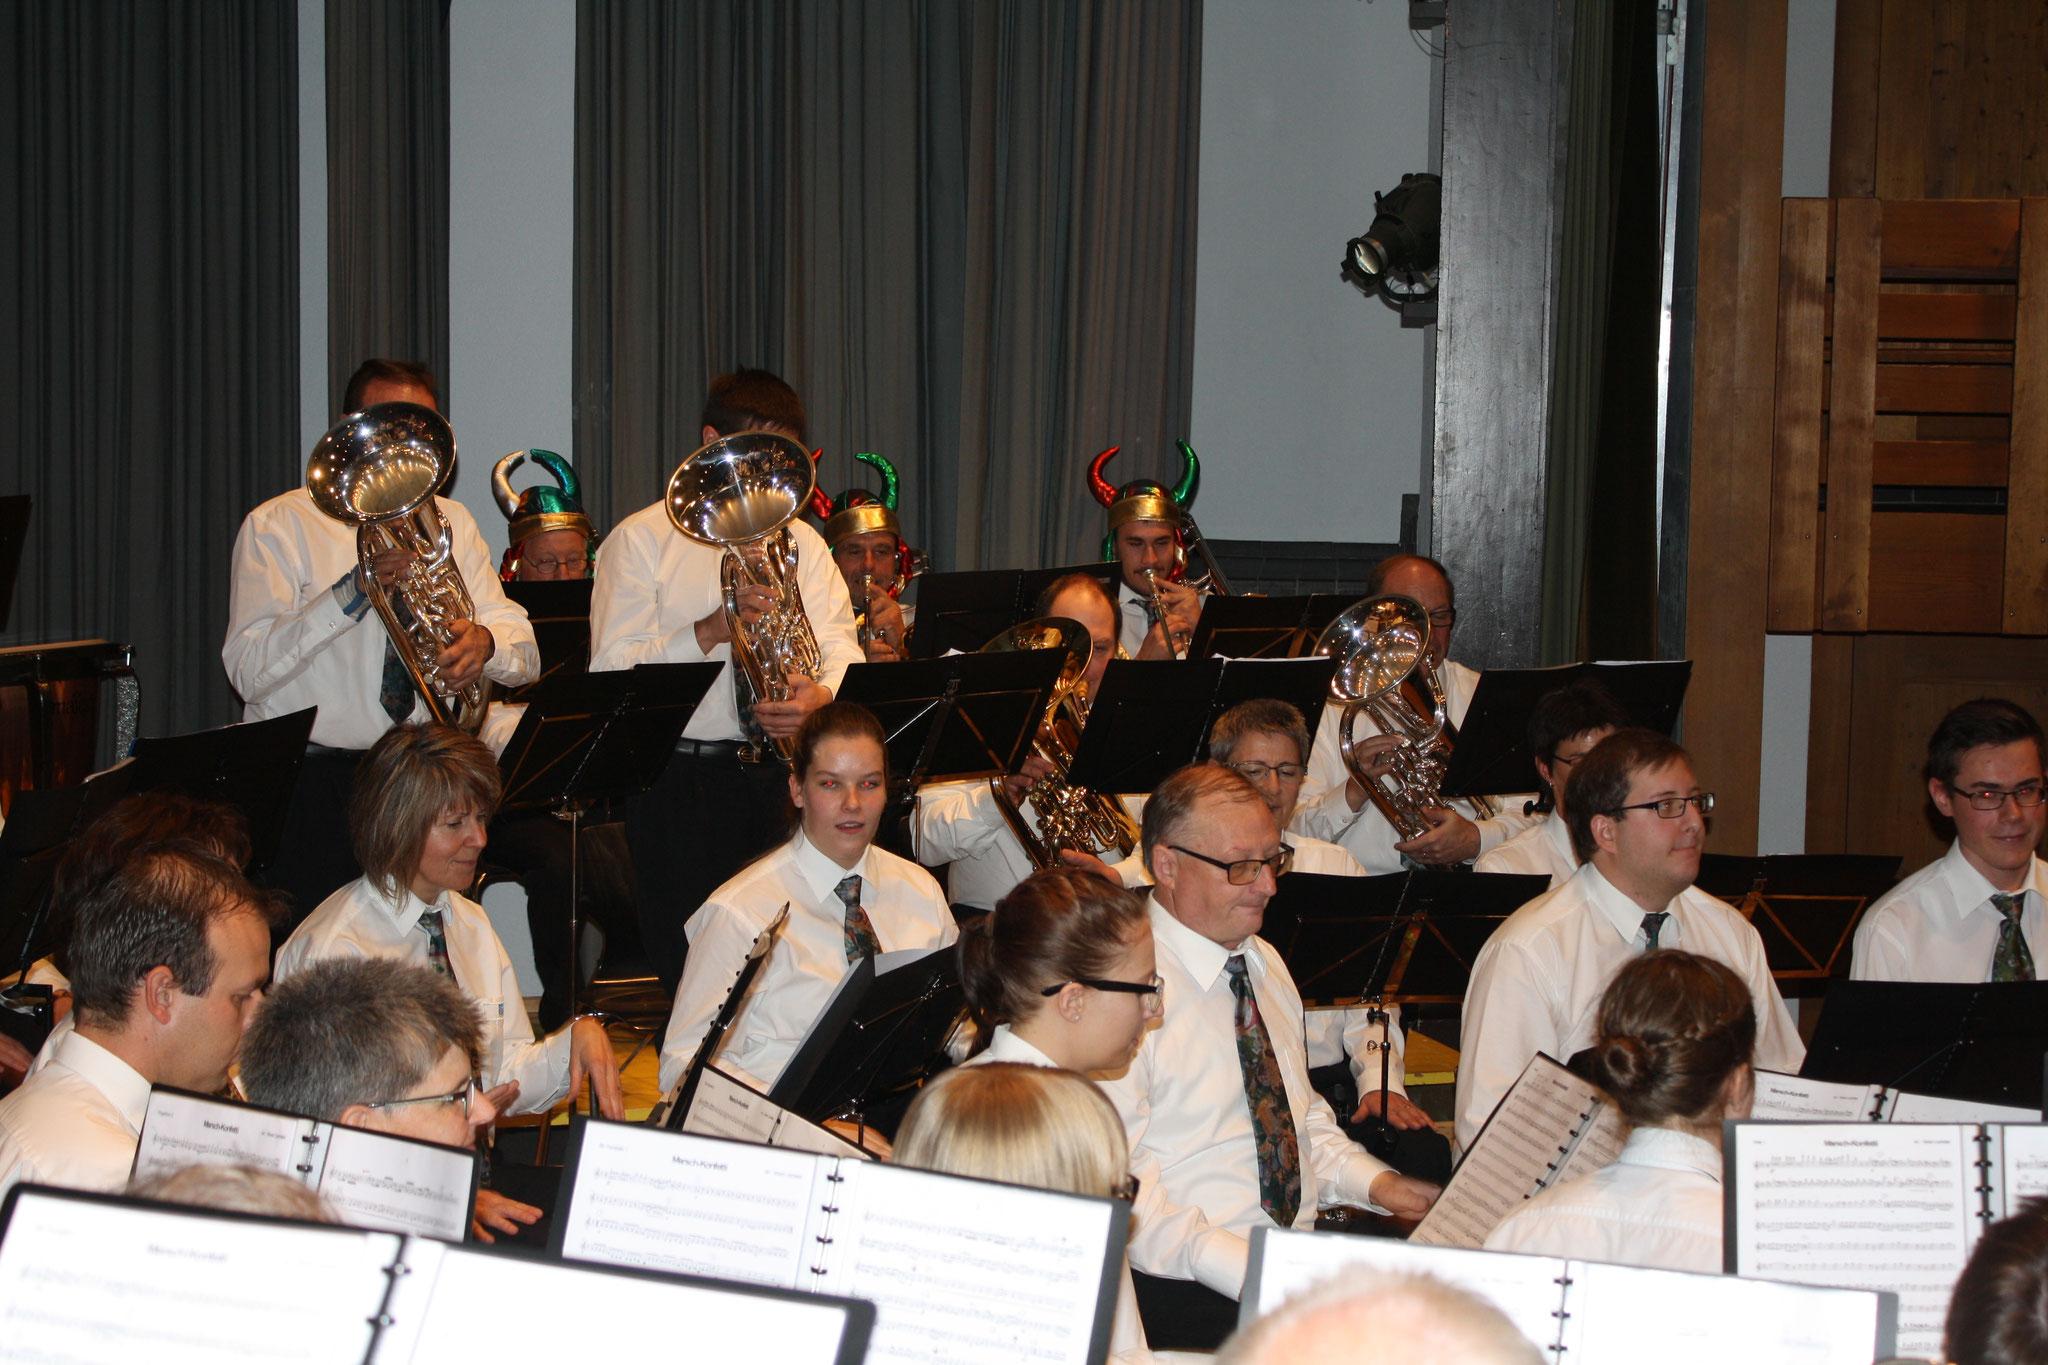 Foto: Theaterverein Elm